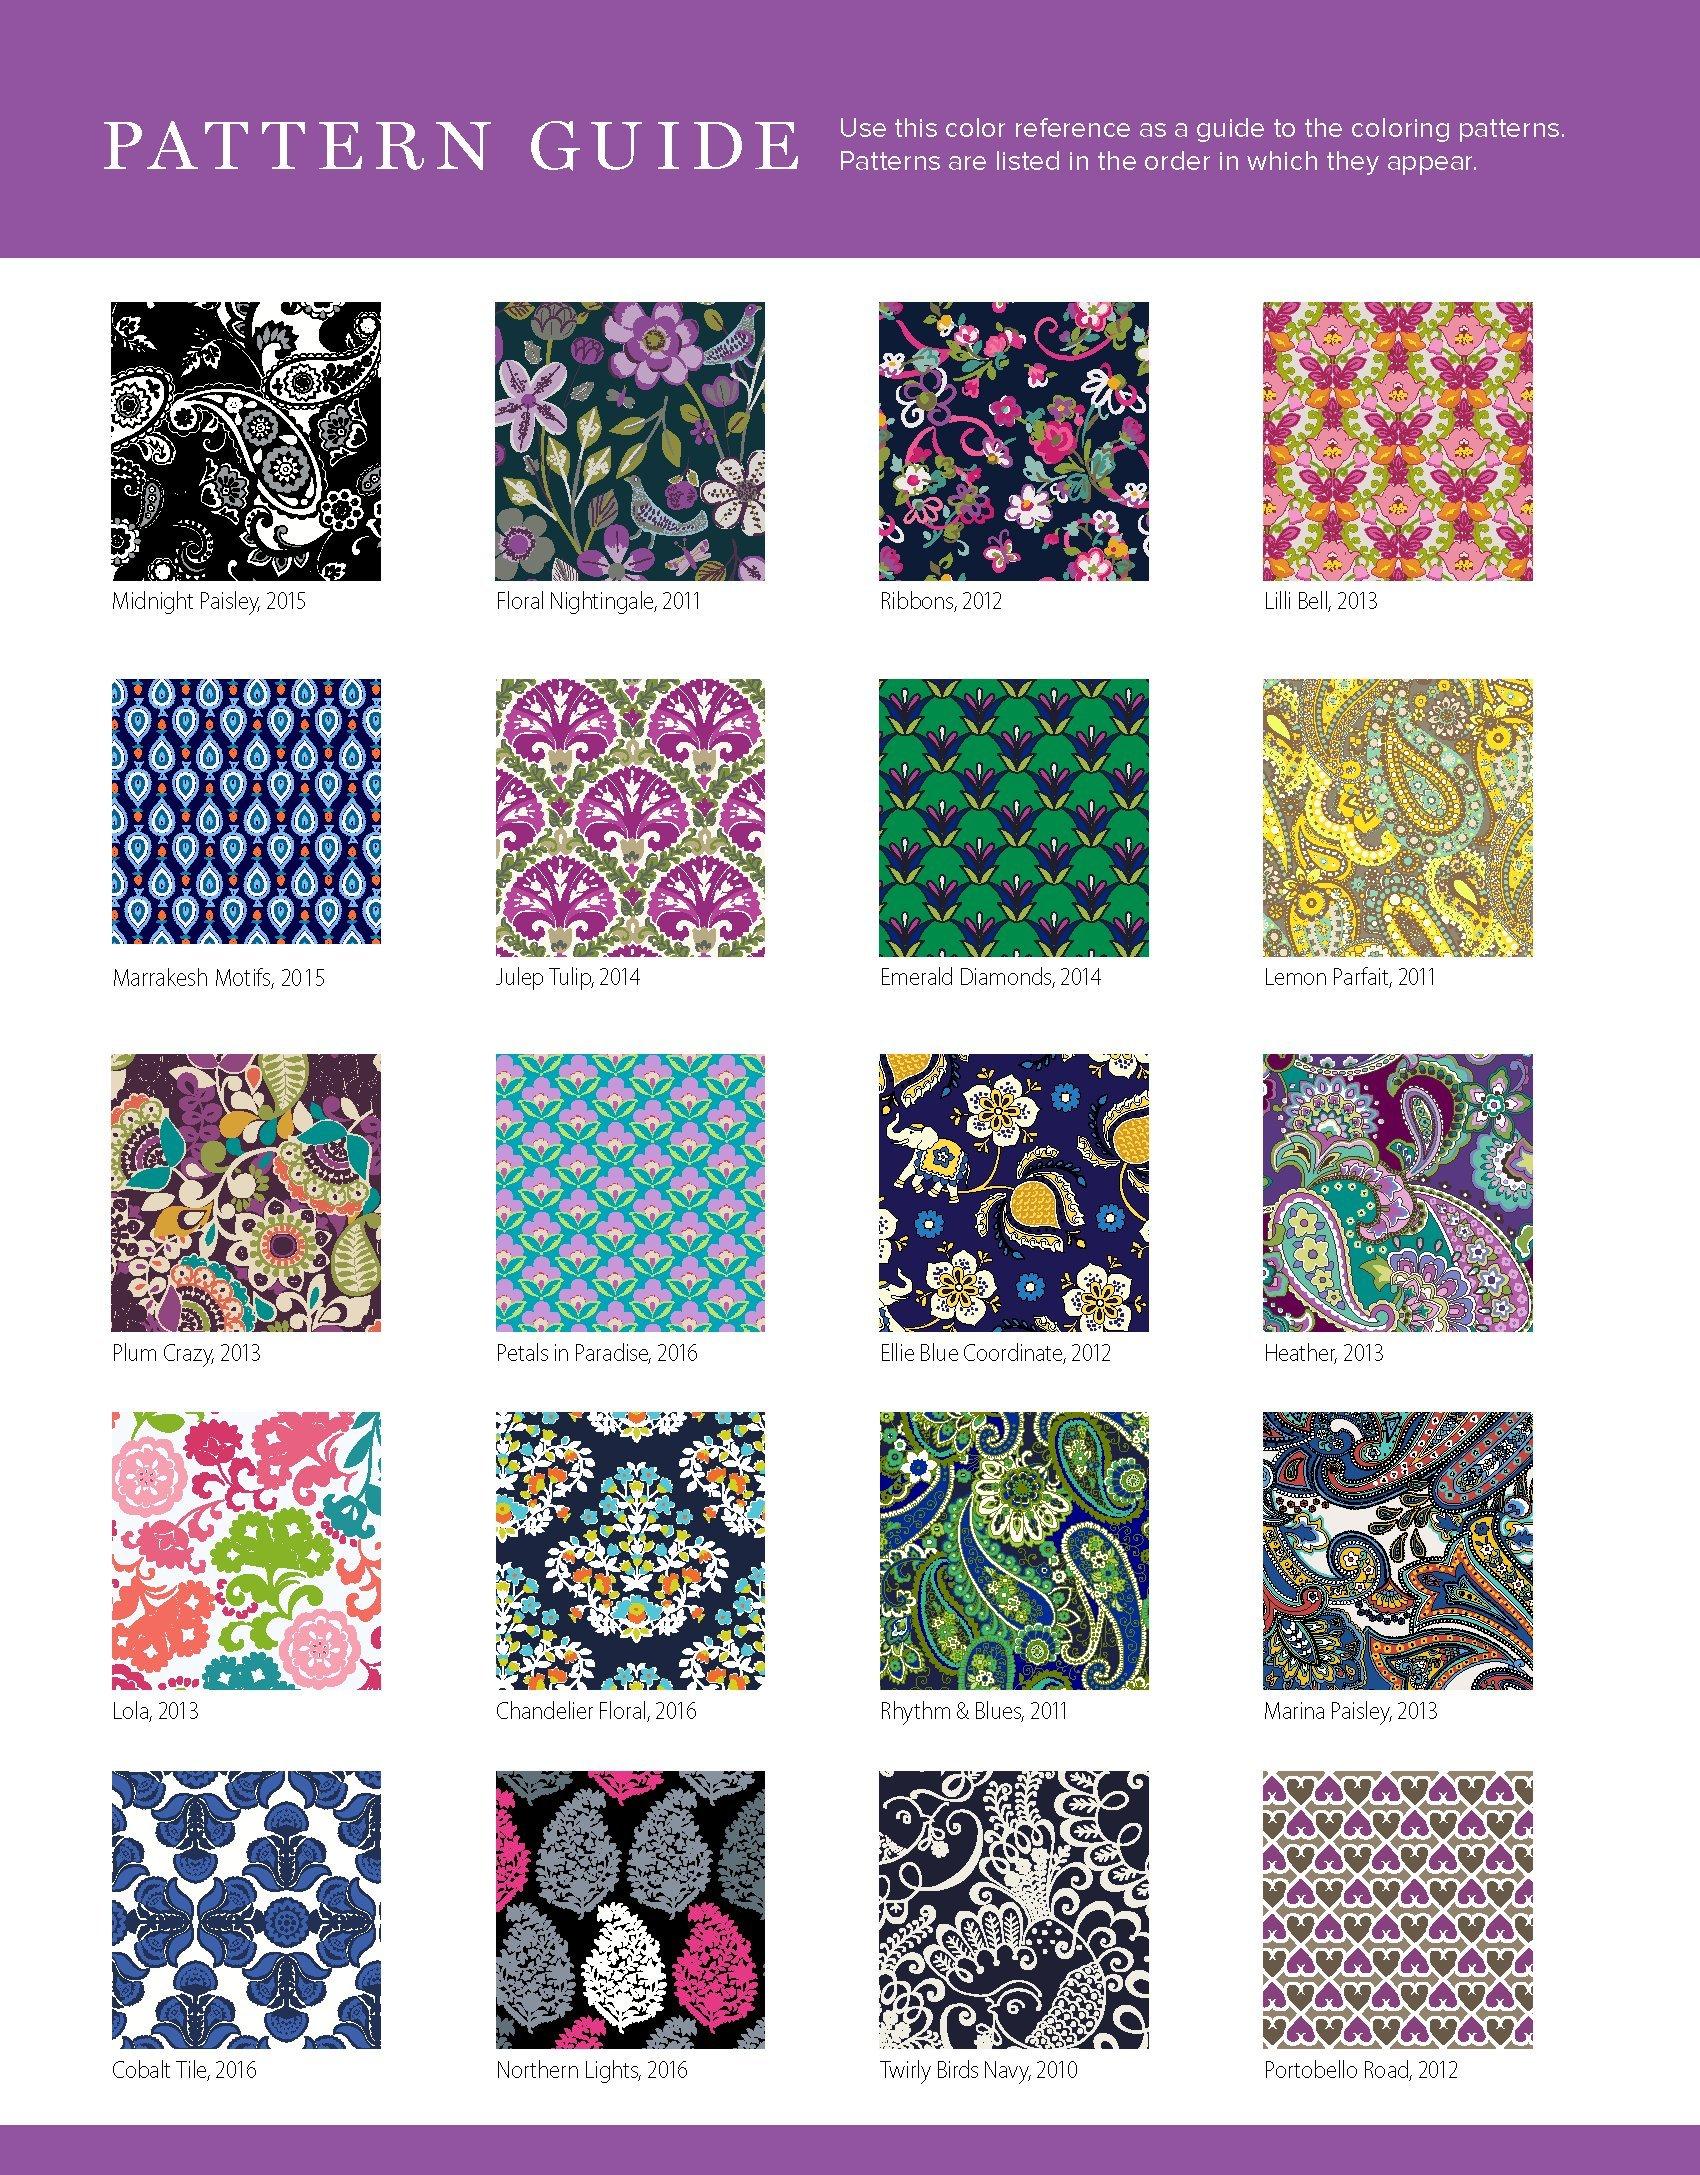 7716f7be1f11 Amazon.com  Vera Bradley Paisley Patterns Coloring Book (Design Originals)  40 Authentic Designs